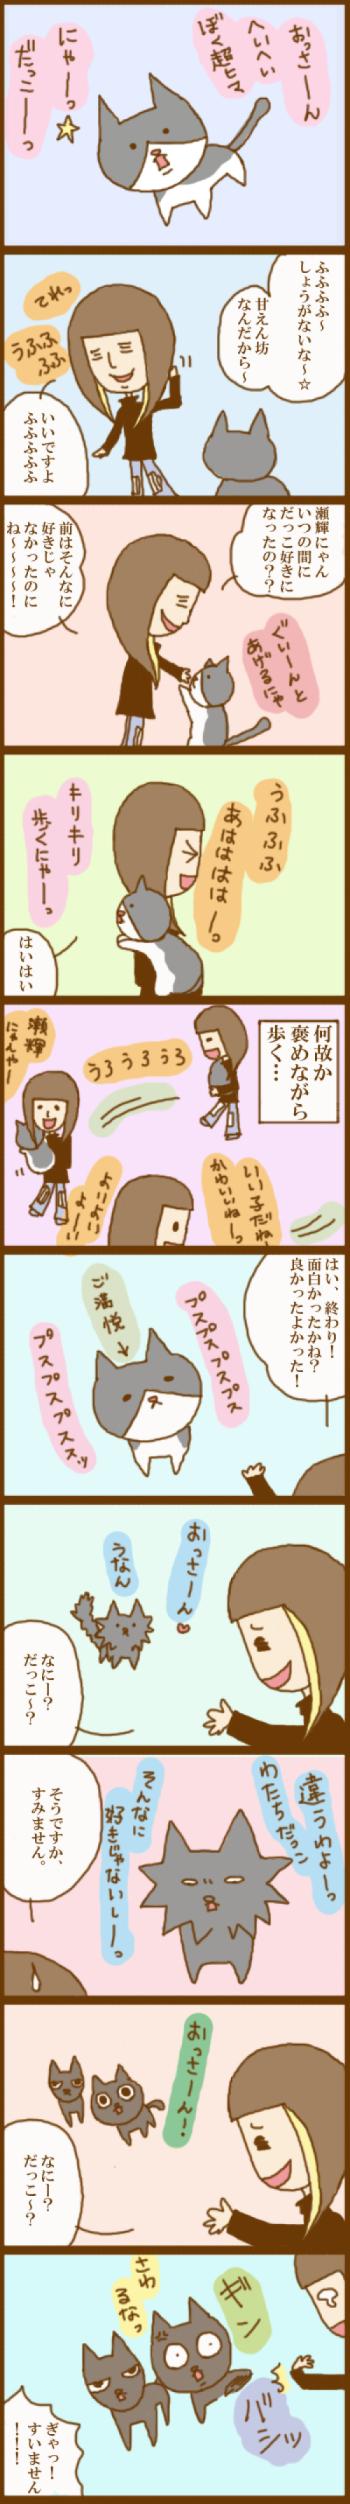 f:id:suzuokayu:20201116113435j:plain